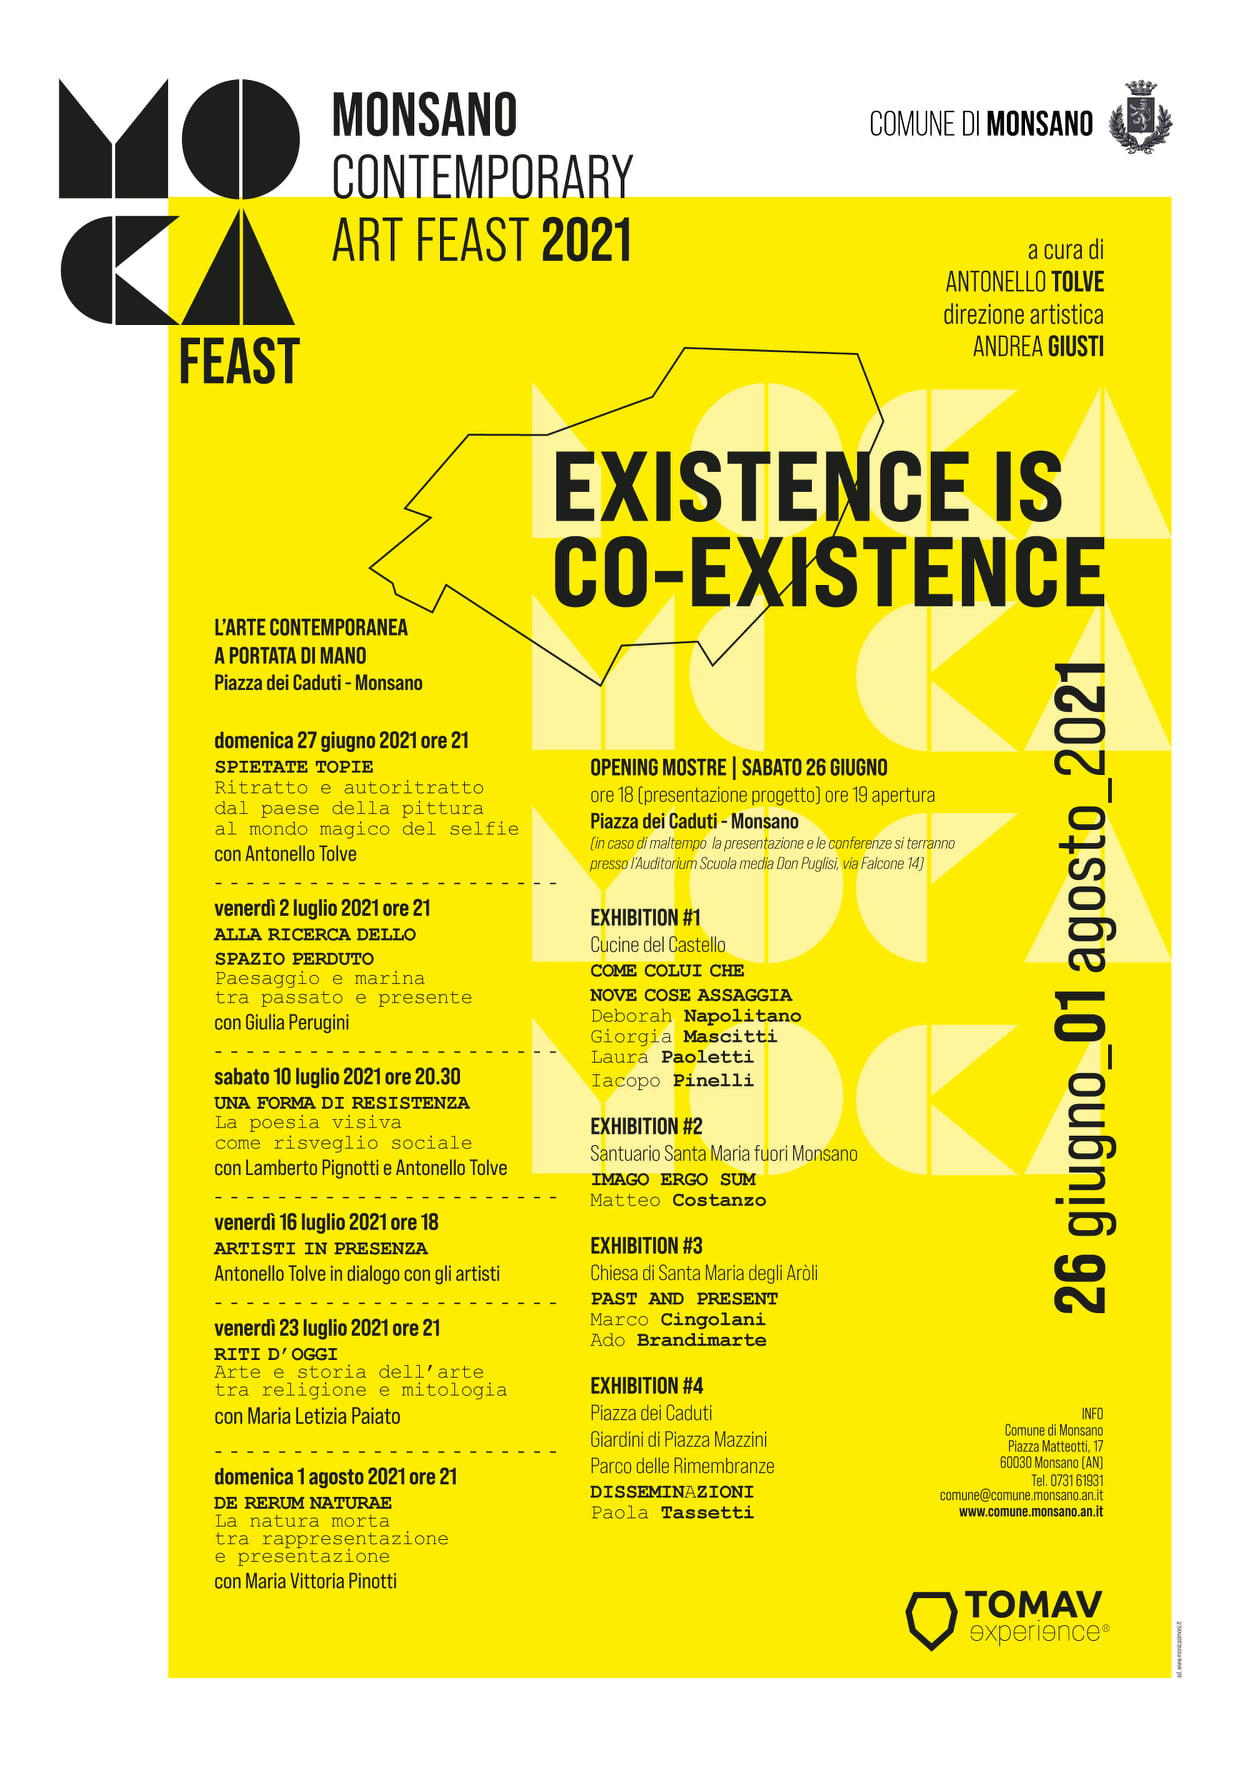 MOCA, MONSANO CONTEMPORARY ART FEAST: EXISTENCE IS CO-EXISTENCE.